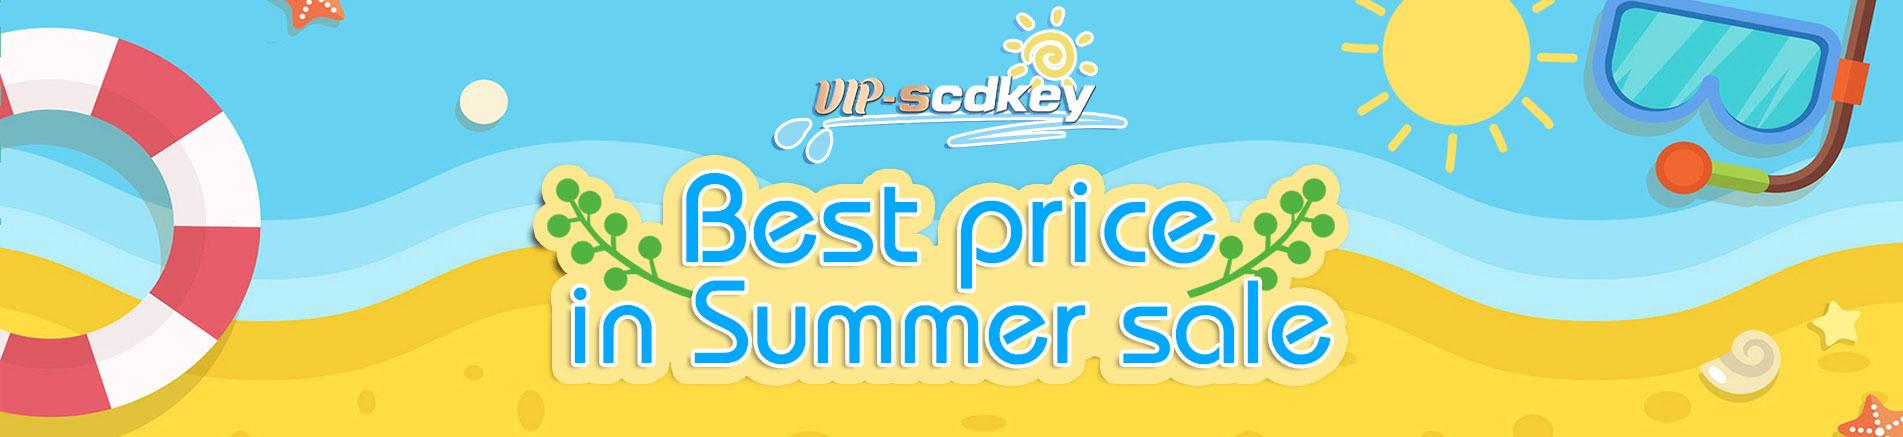 vip-scdkey summersale